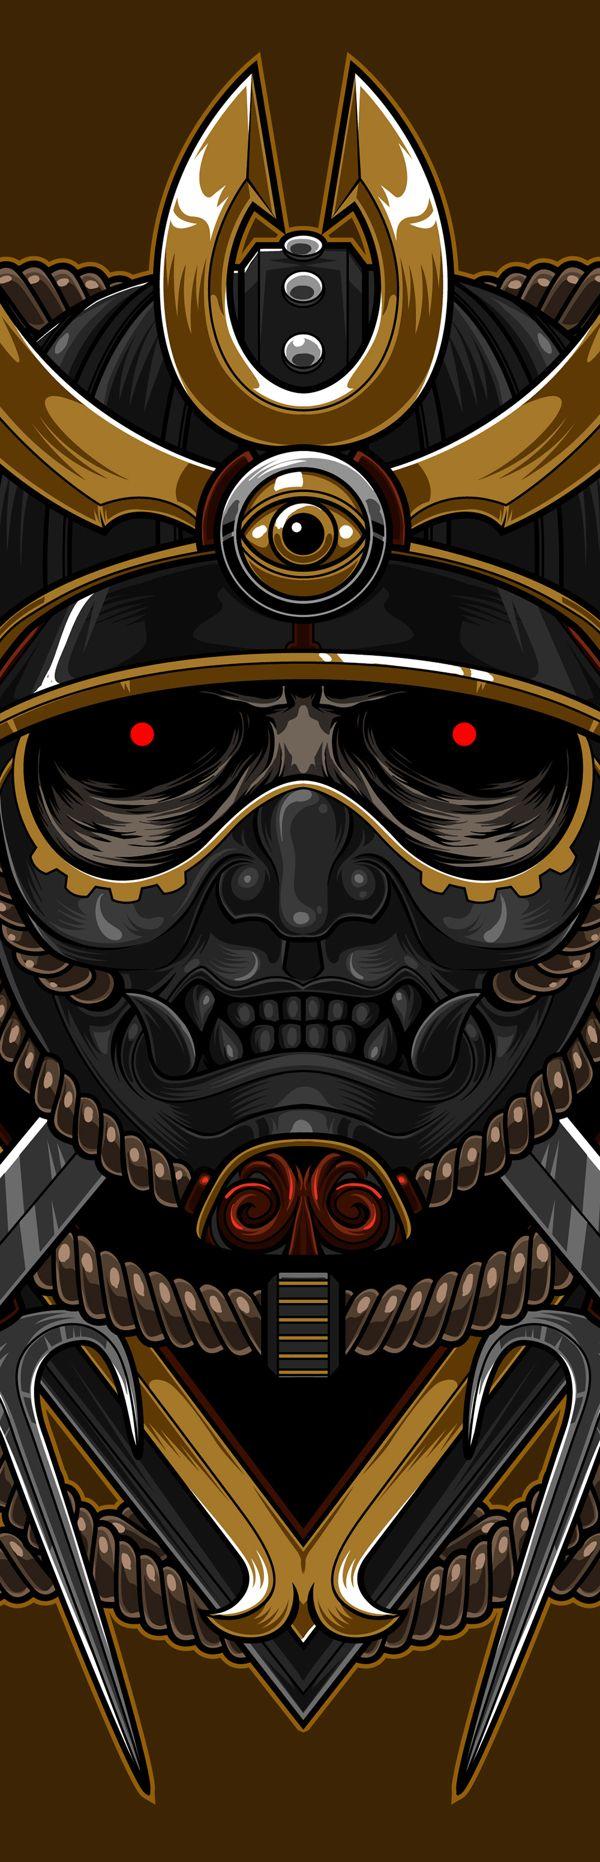 The Blackout Samurai by Charles AP, via Behance